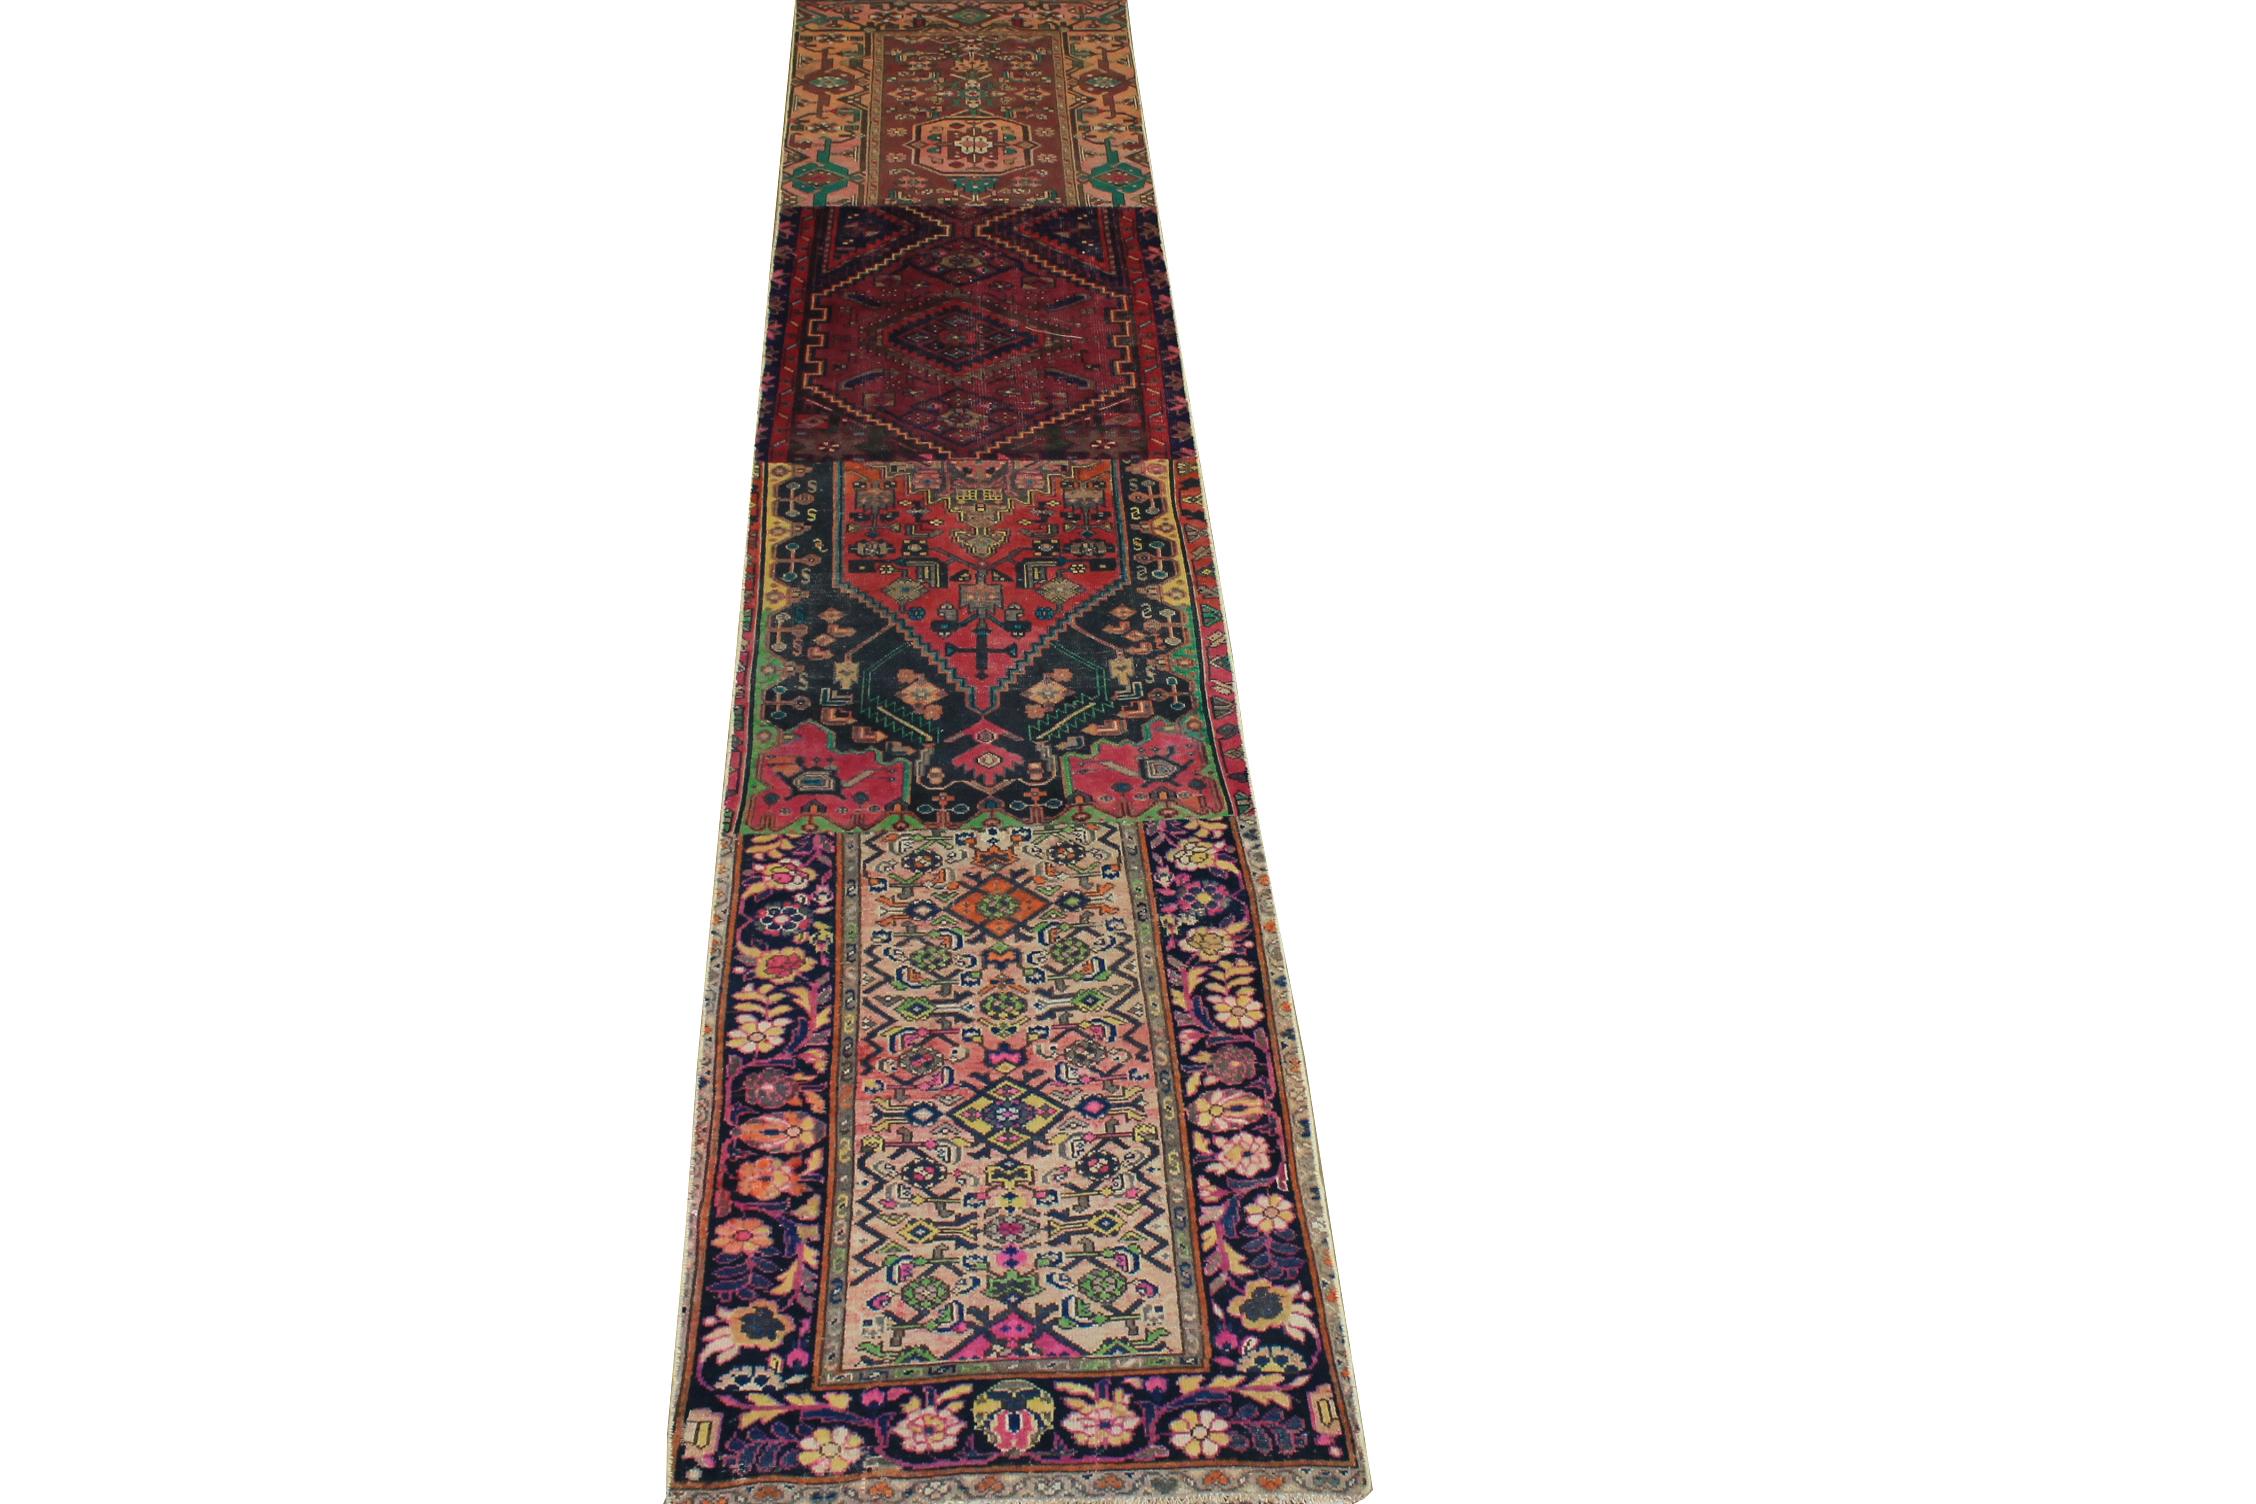 13 ft. & Longer Runner Vintage Hand Knotted Wool Area Rug - MR024508